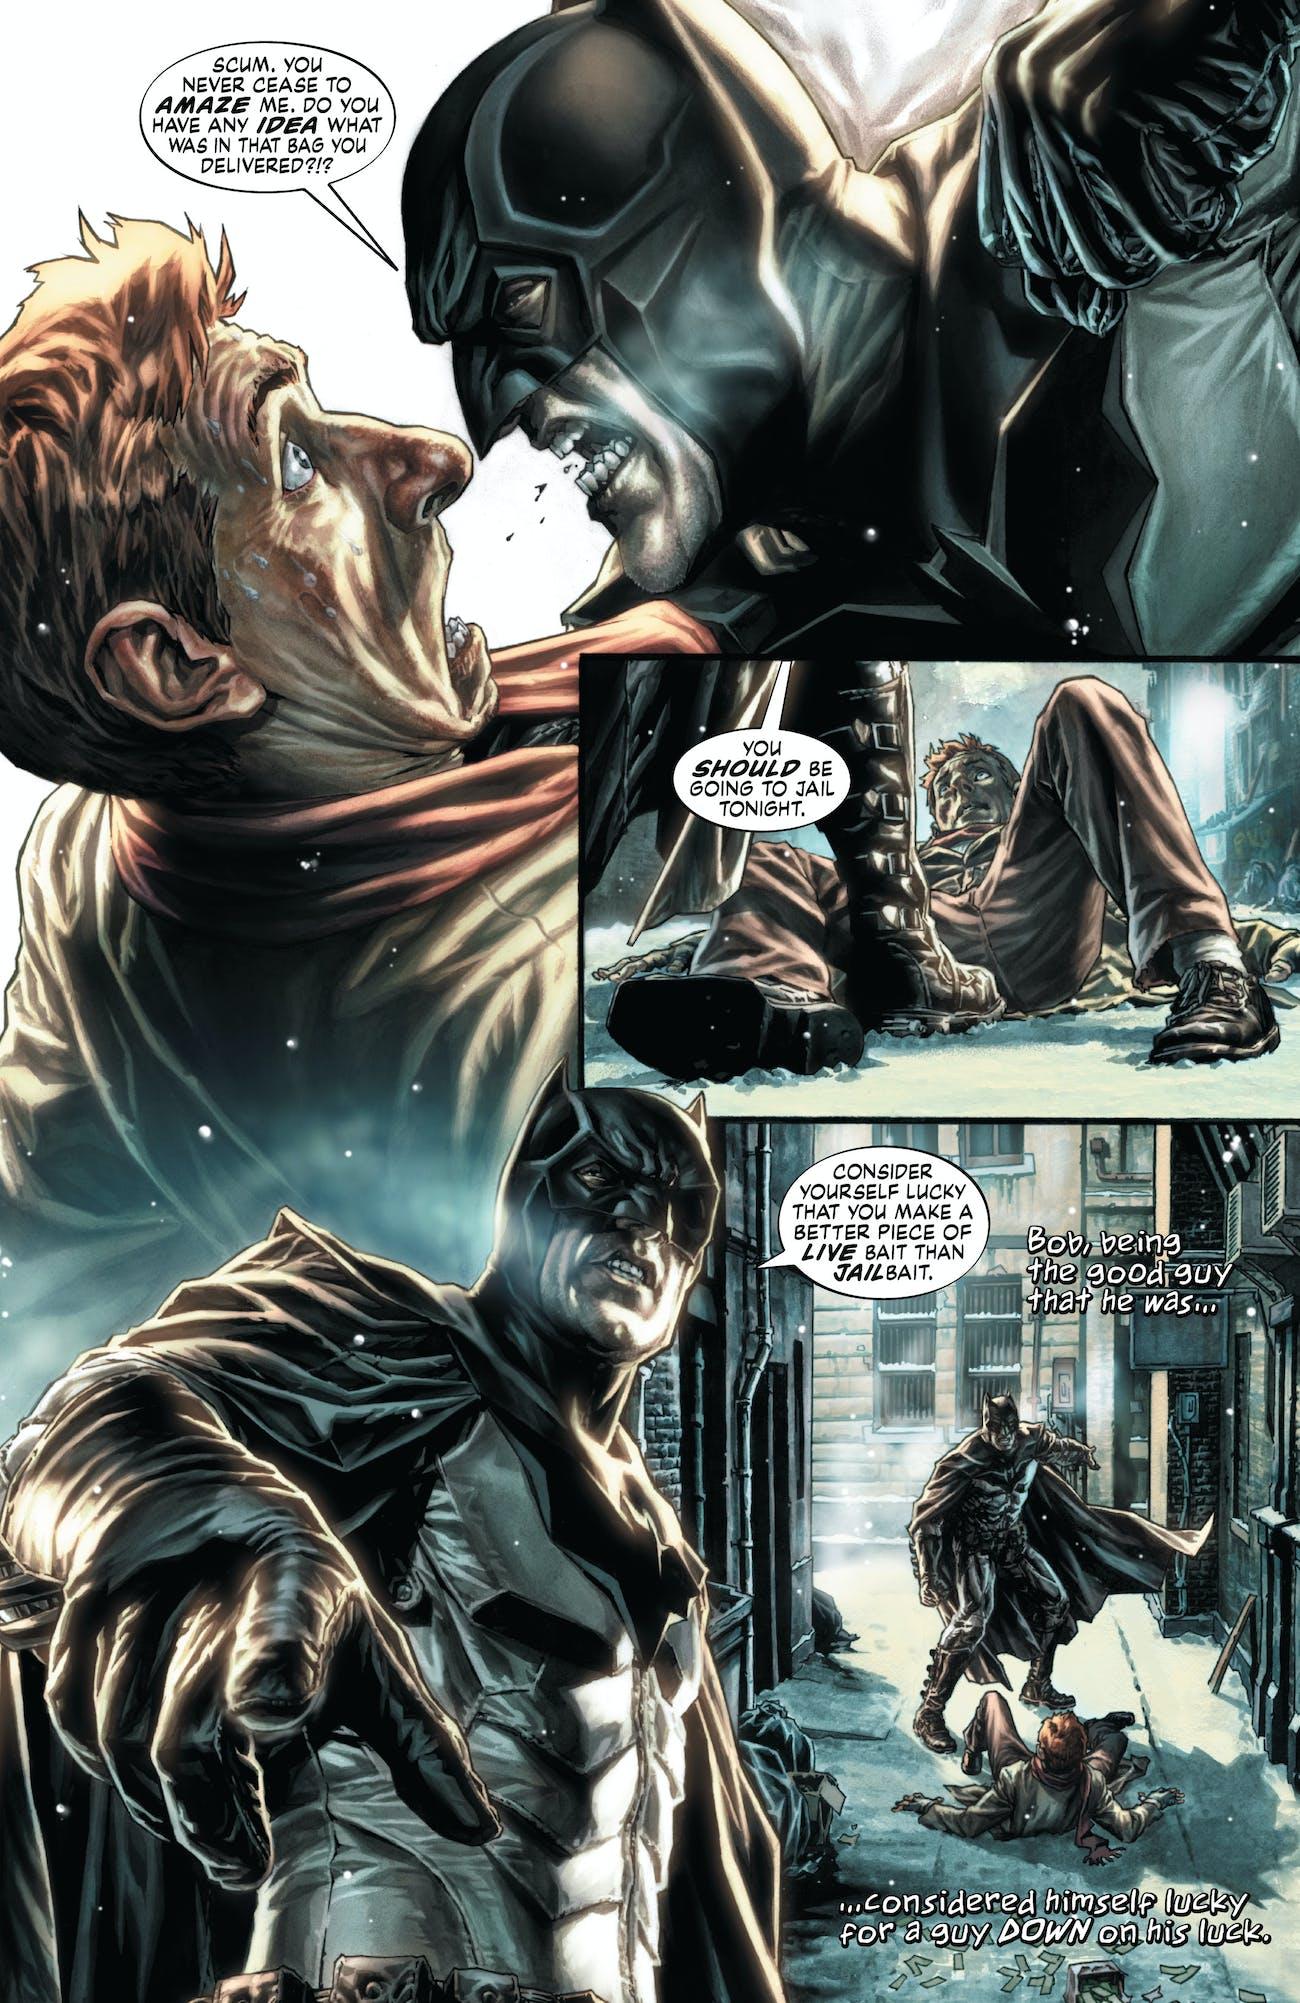 Batman Christmas.5 Dark Christmas Comic Books For A Moody Holiday Inverse